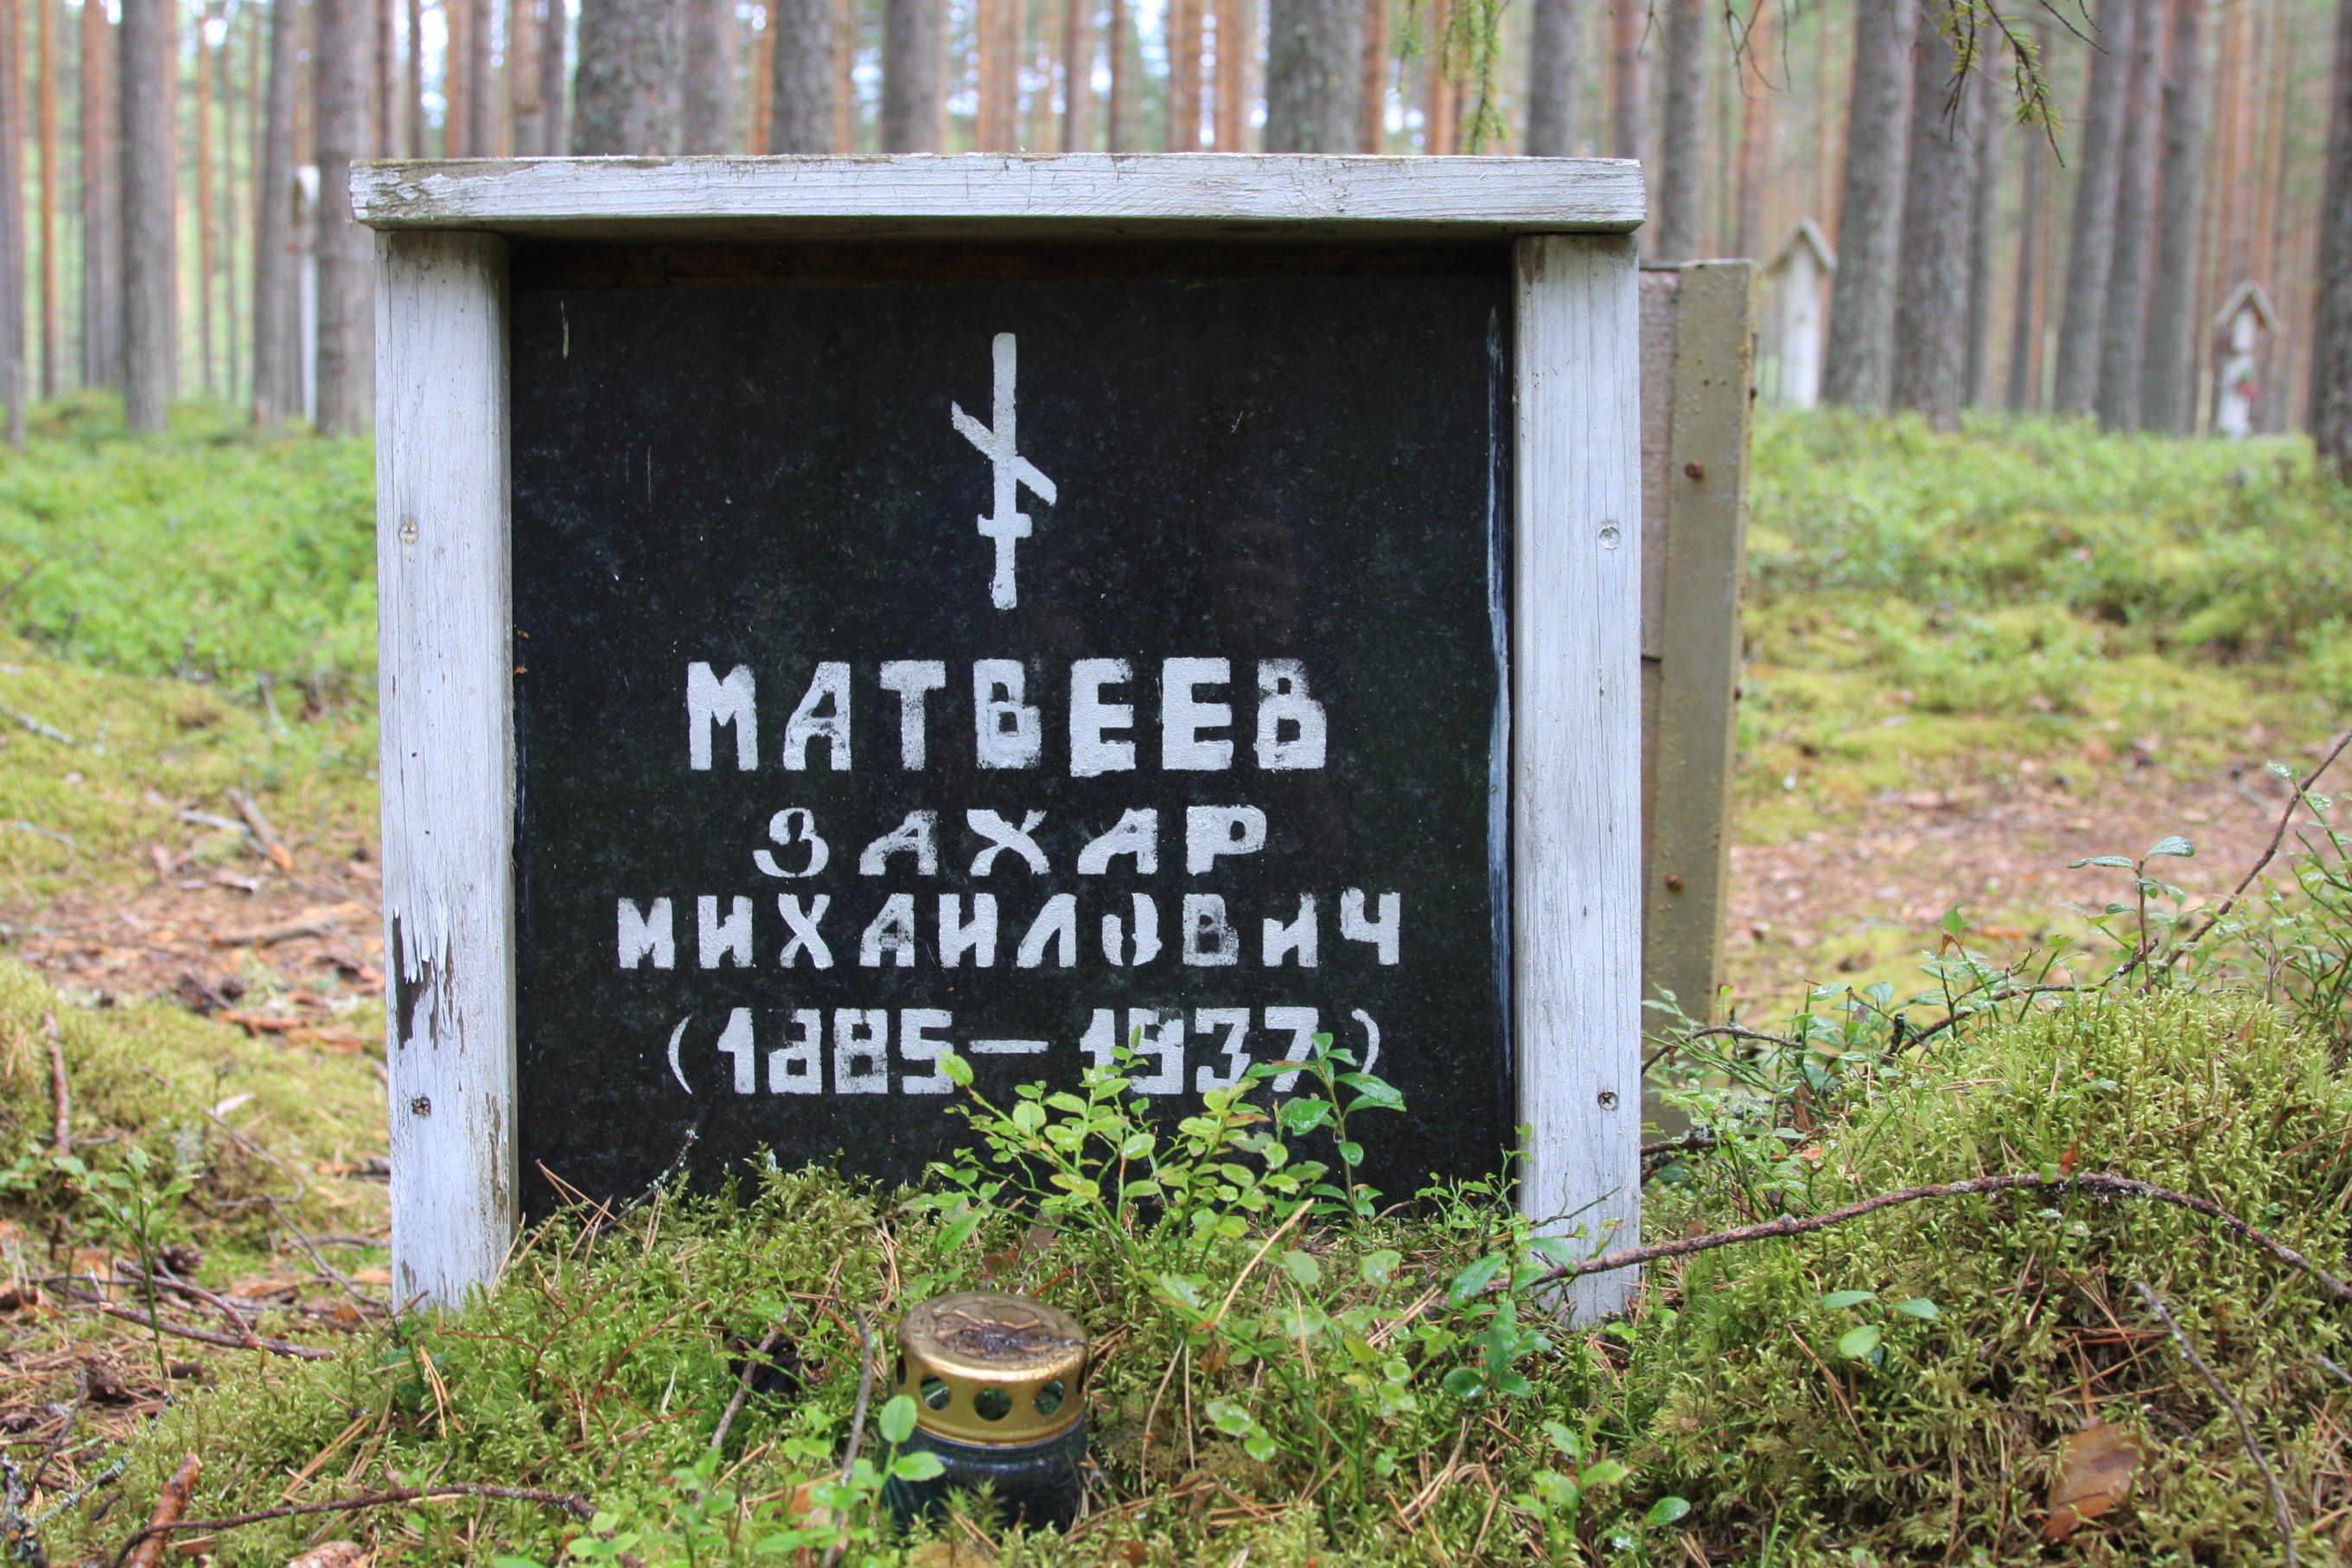 Памятный знак «Матвеев Захар Михайлович». Фото 04.08.2018.